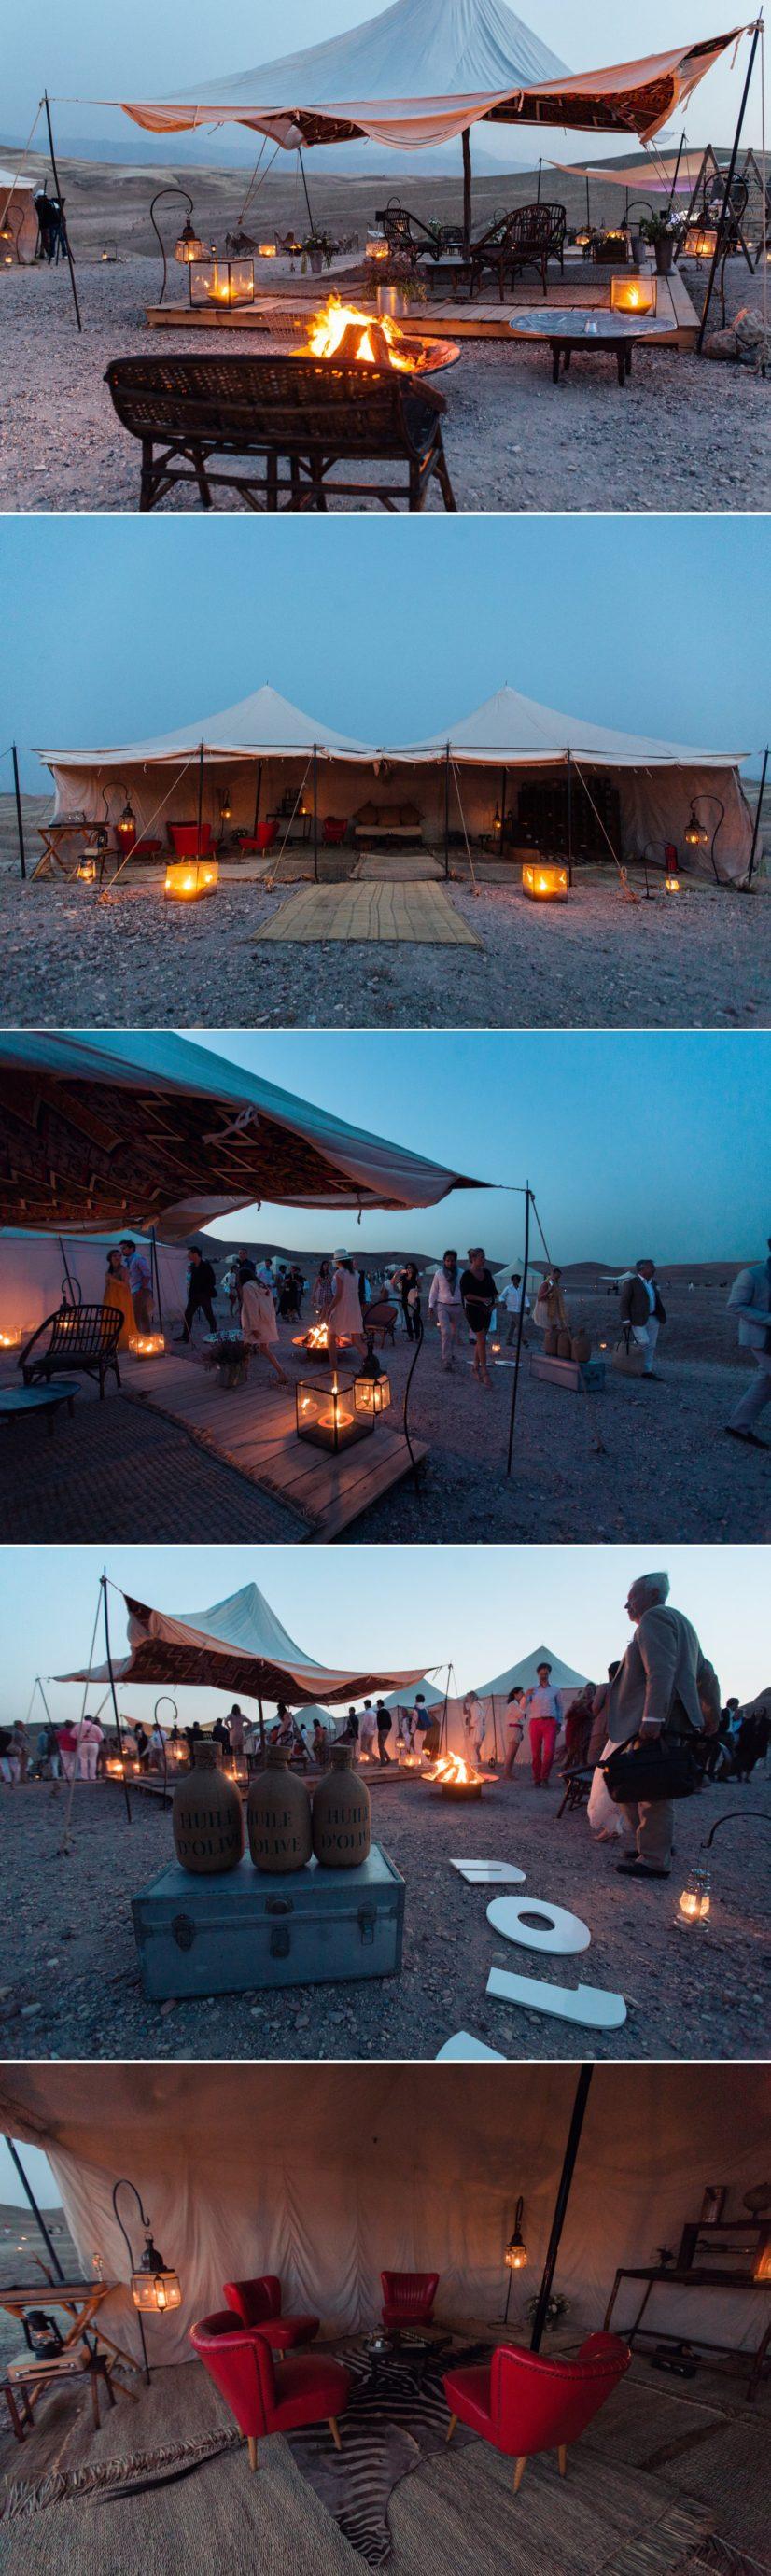 Camp mariage dans le desert Scarabéo